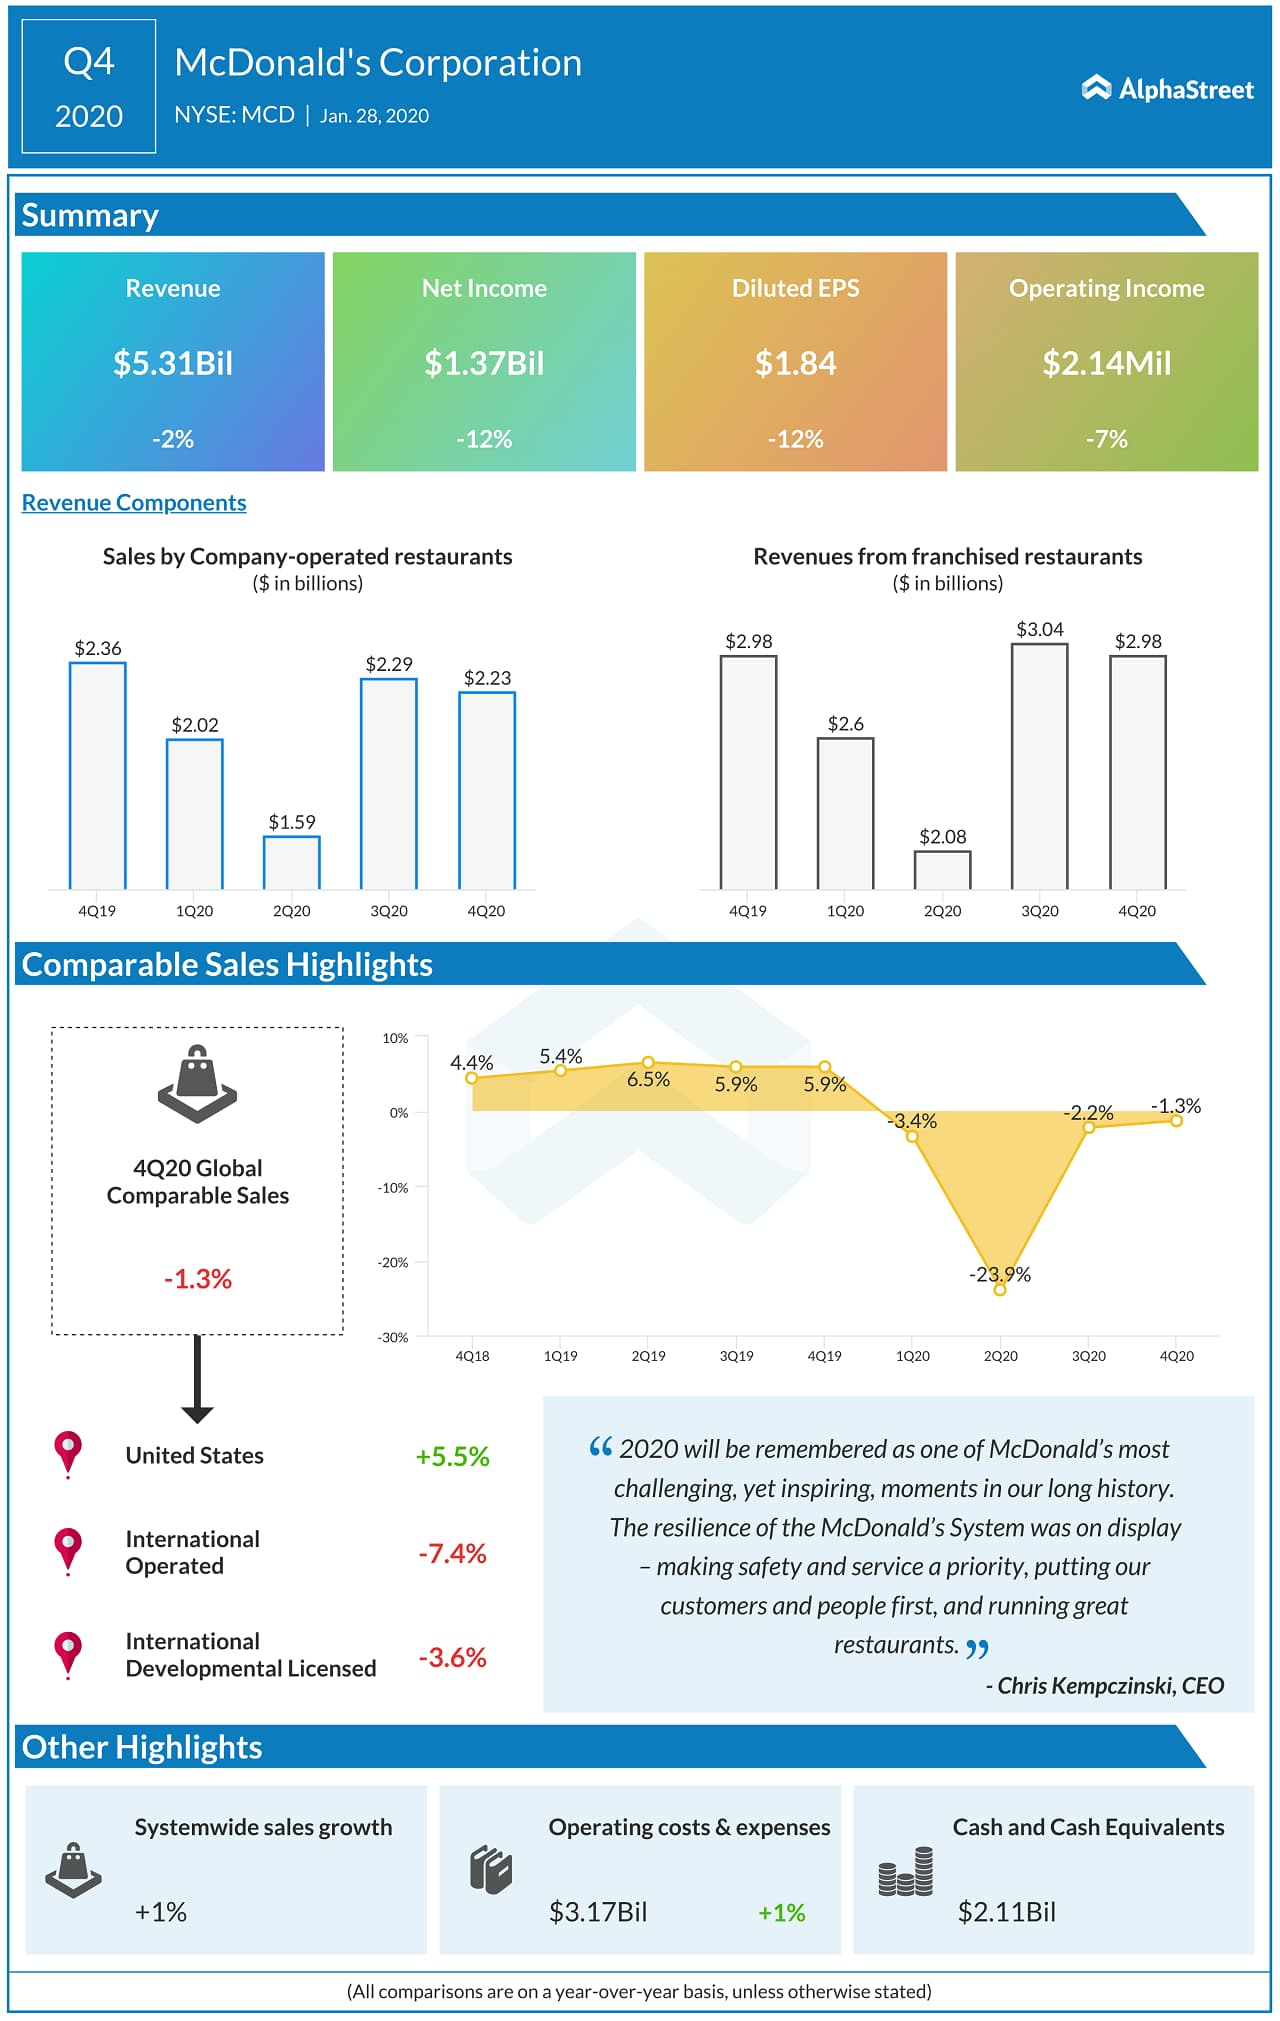 McDonald's Q4 2020 earnings infographic